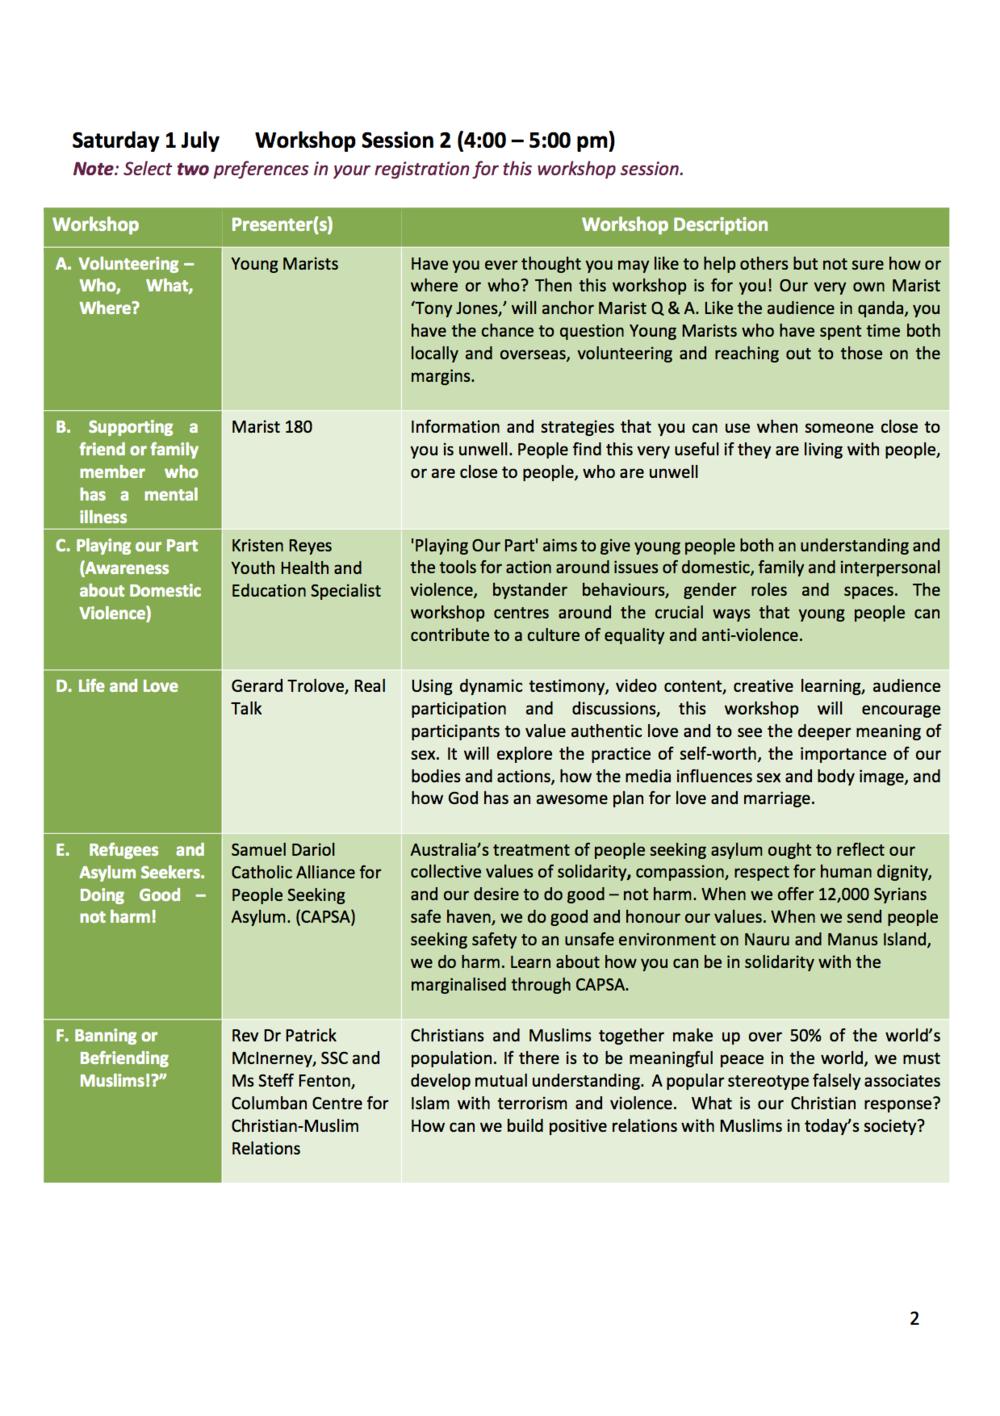 We pdf how do harm